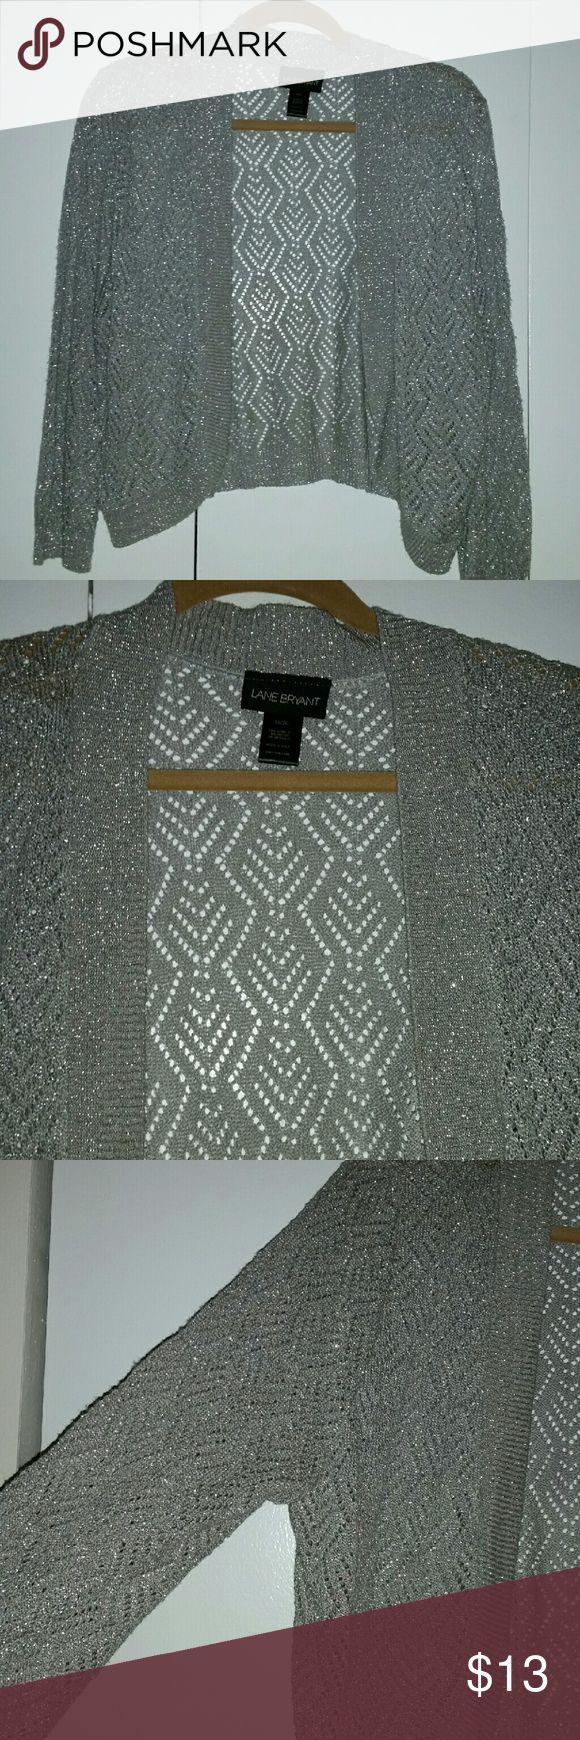 Lane Bryant grey/silver plus size shrug sweater Grey shrug sweater with silver mettalic threading. Great for the holidays! Lane Bryant Sweaters Shrugs & Ponchos